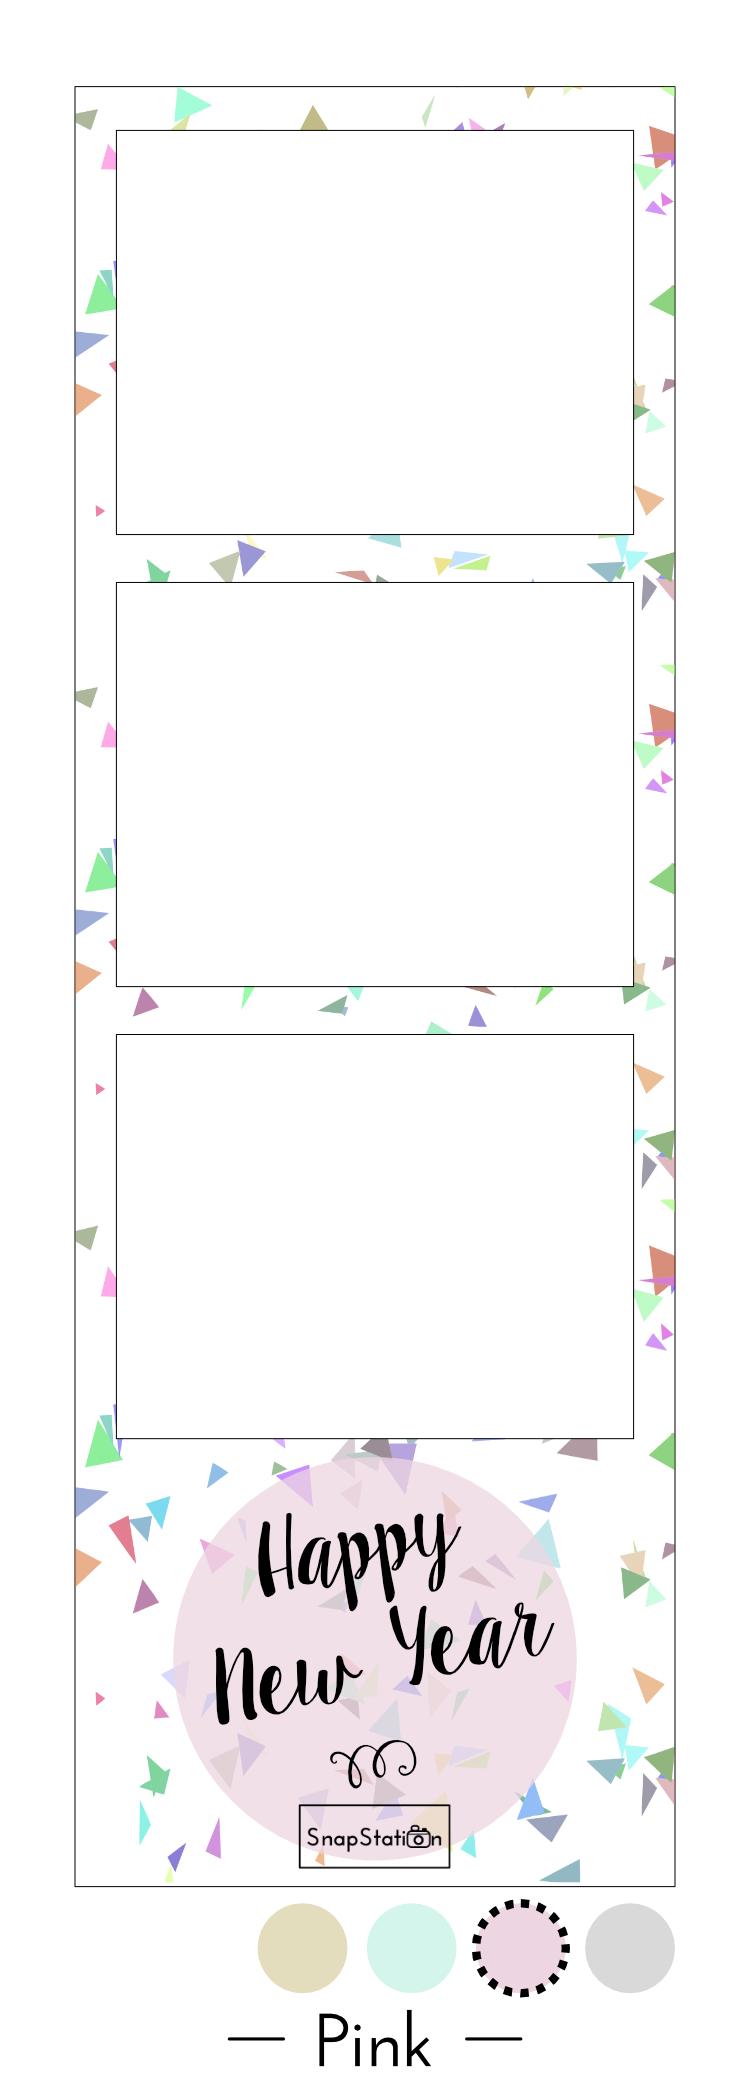 Photo strip confetti - Pink.jpg